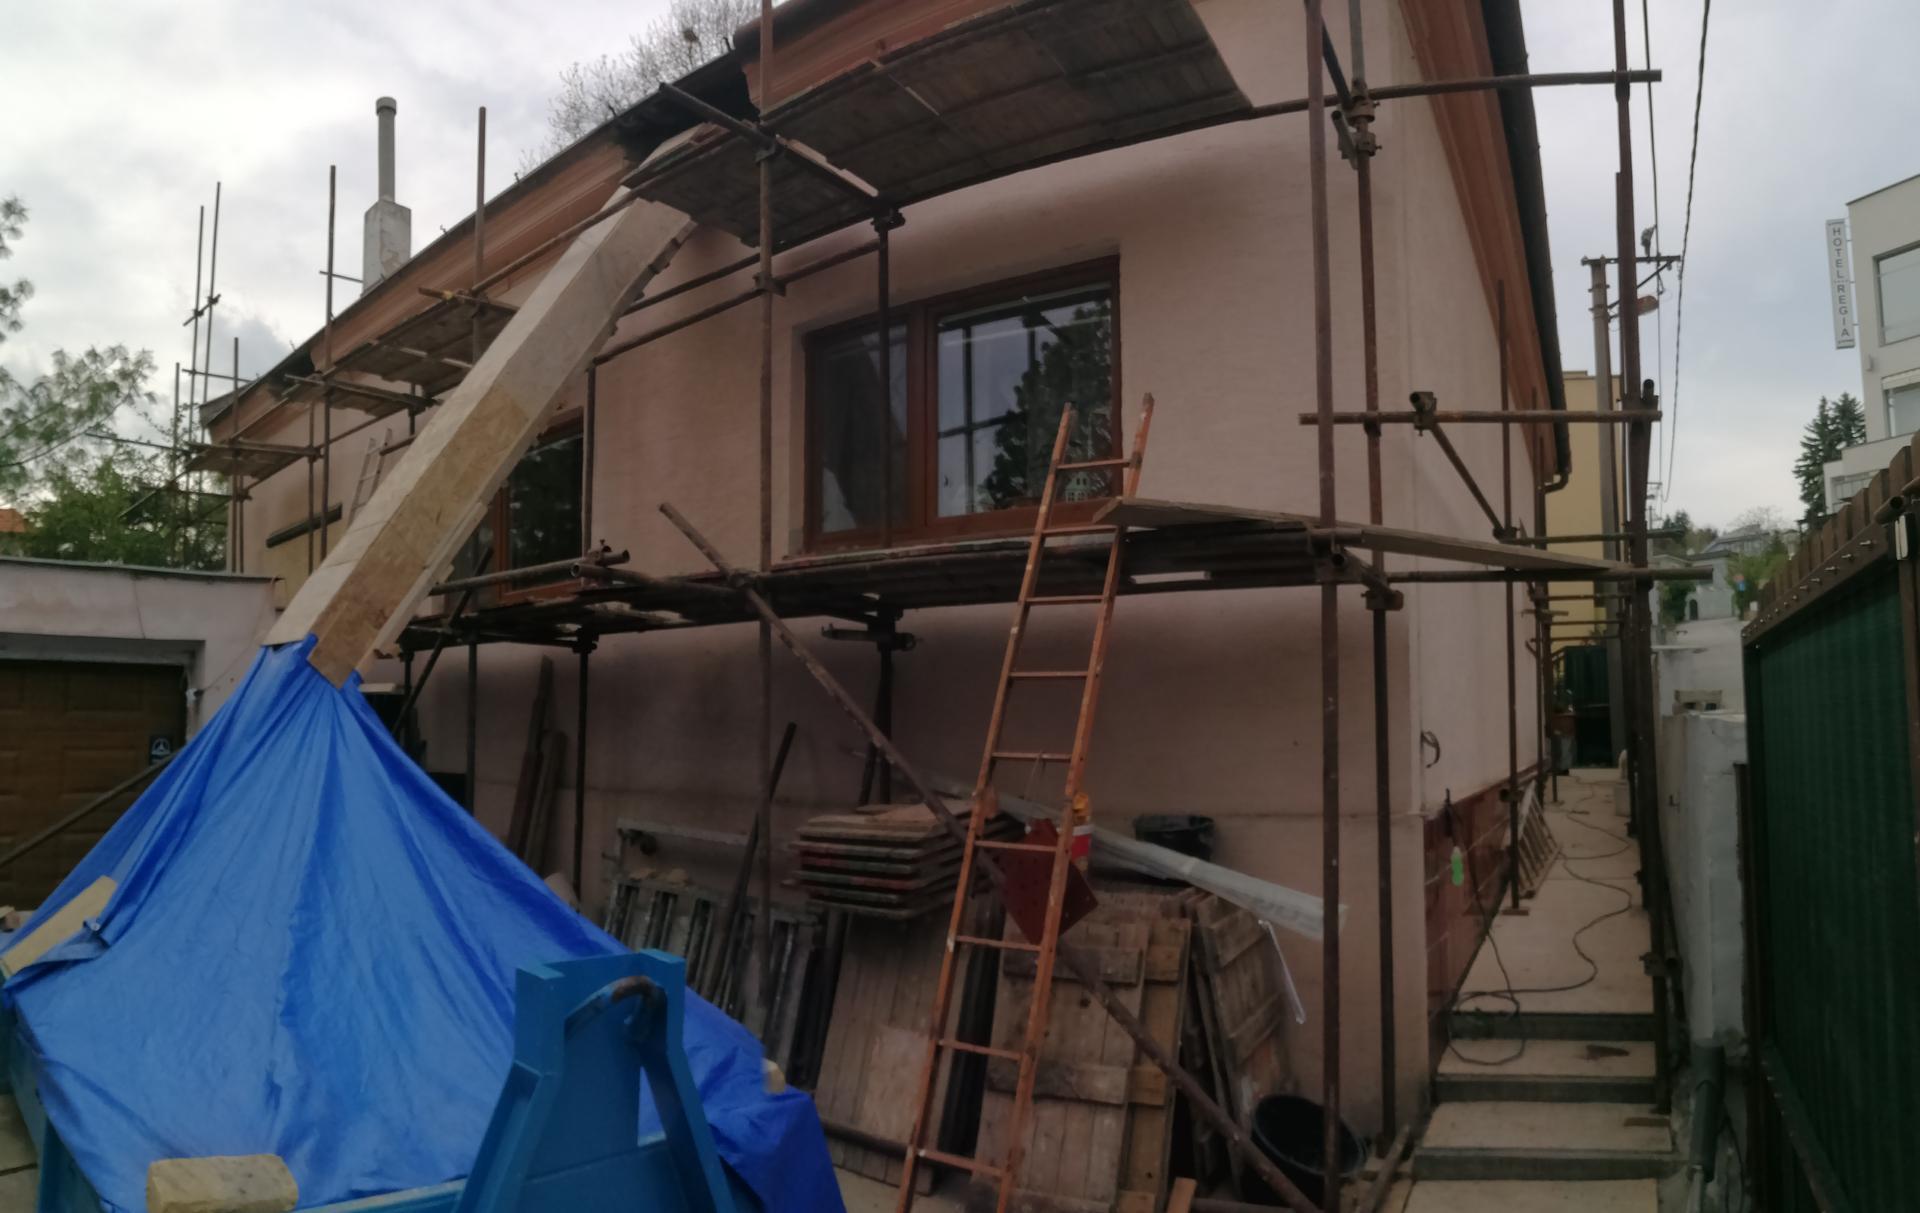 Prestavba podkrovia zo sedlovo valbovej na sedlovú strechu. - Obrázok č. 35